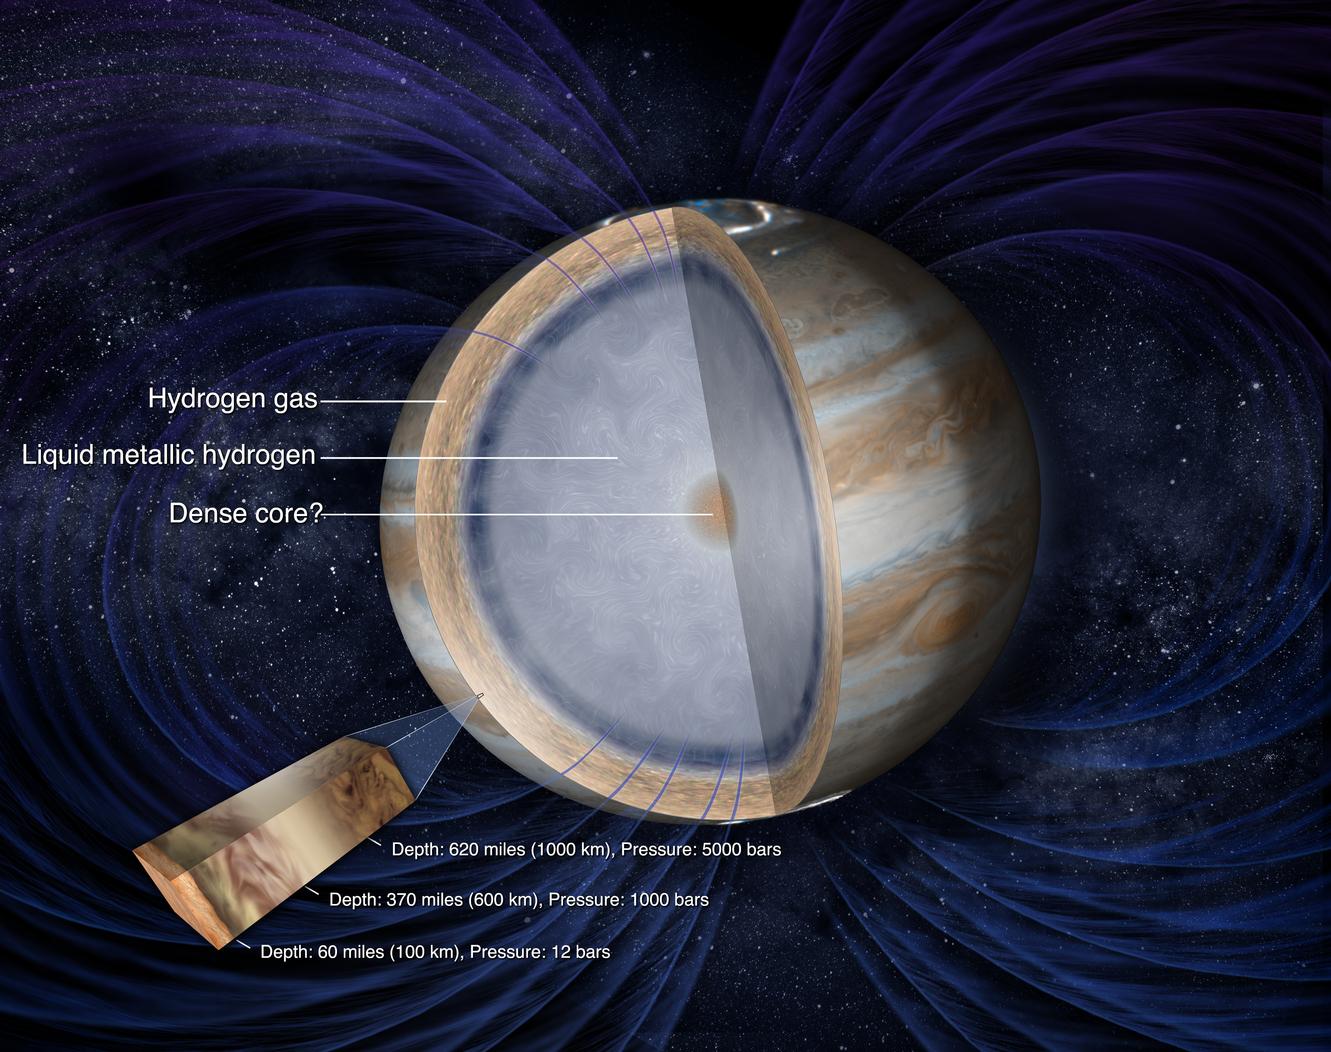 The exotic interior of Jupiter, hidden deep below the visible cloud layers. Does a dense core actually exist? - Image Credit: NASA/JPL